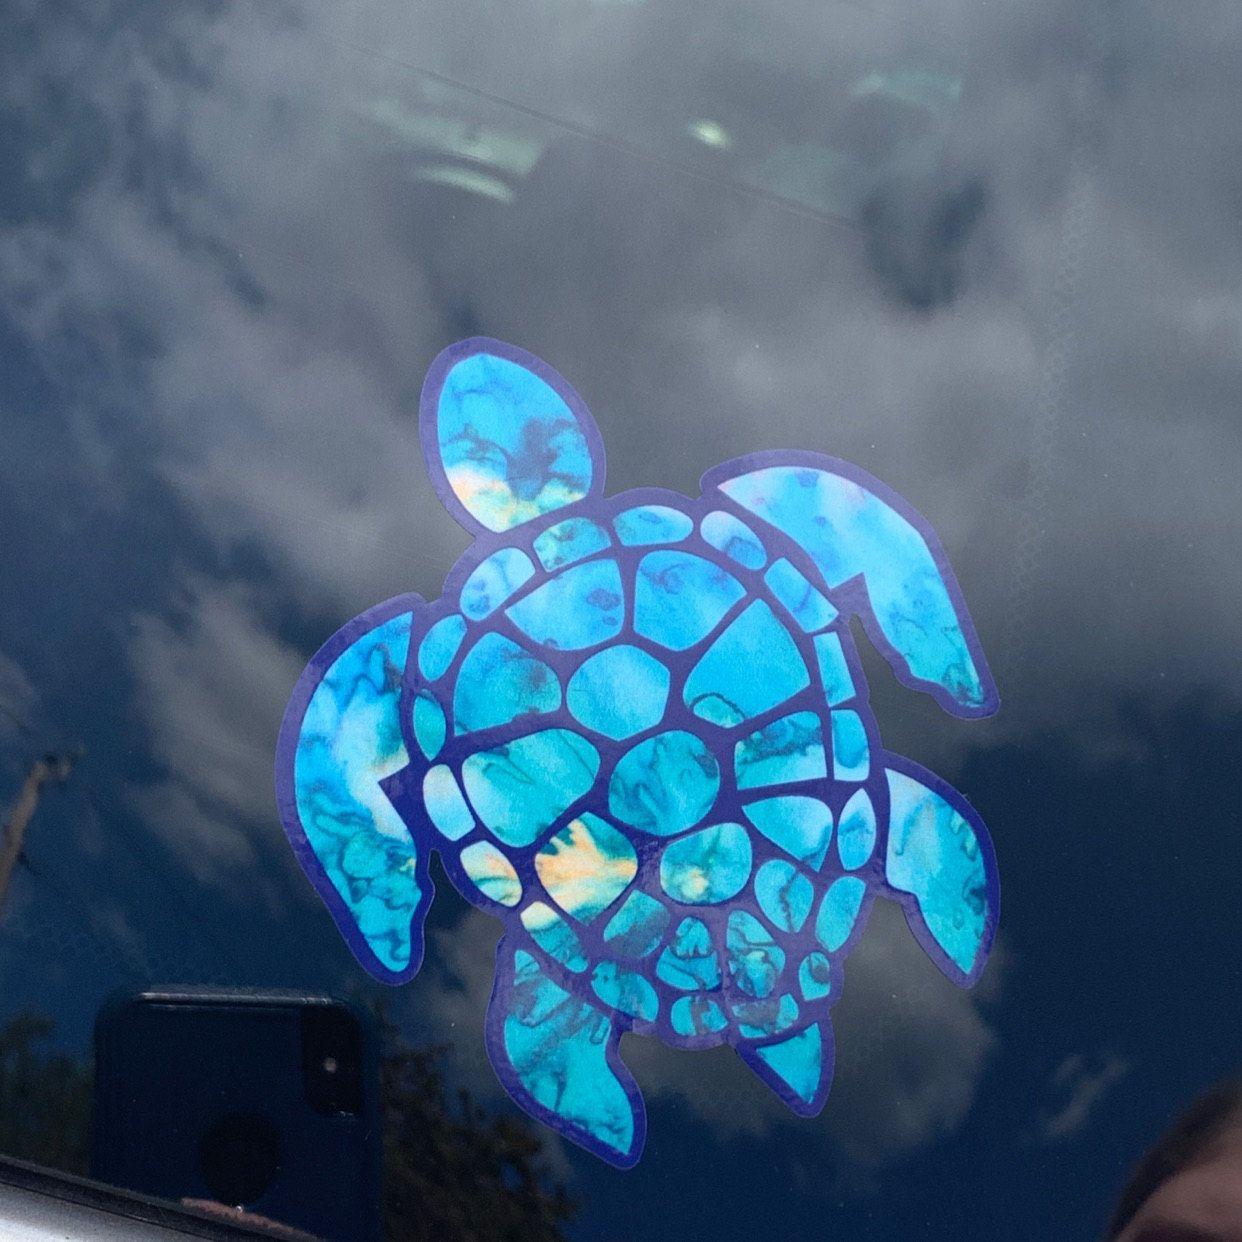 Car Decal Yeti Decal Sea Turtle Decal Decal For Women Etsy Sea Turtle Decal Decals For Yeti Cups Yeti Decals [ 1242 x 1242 Pixel ]